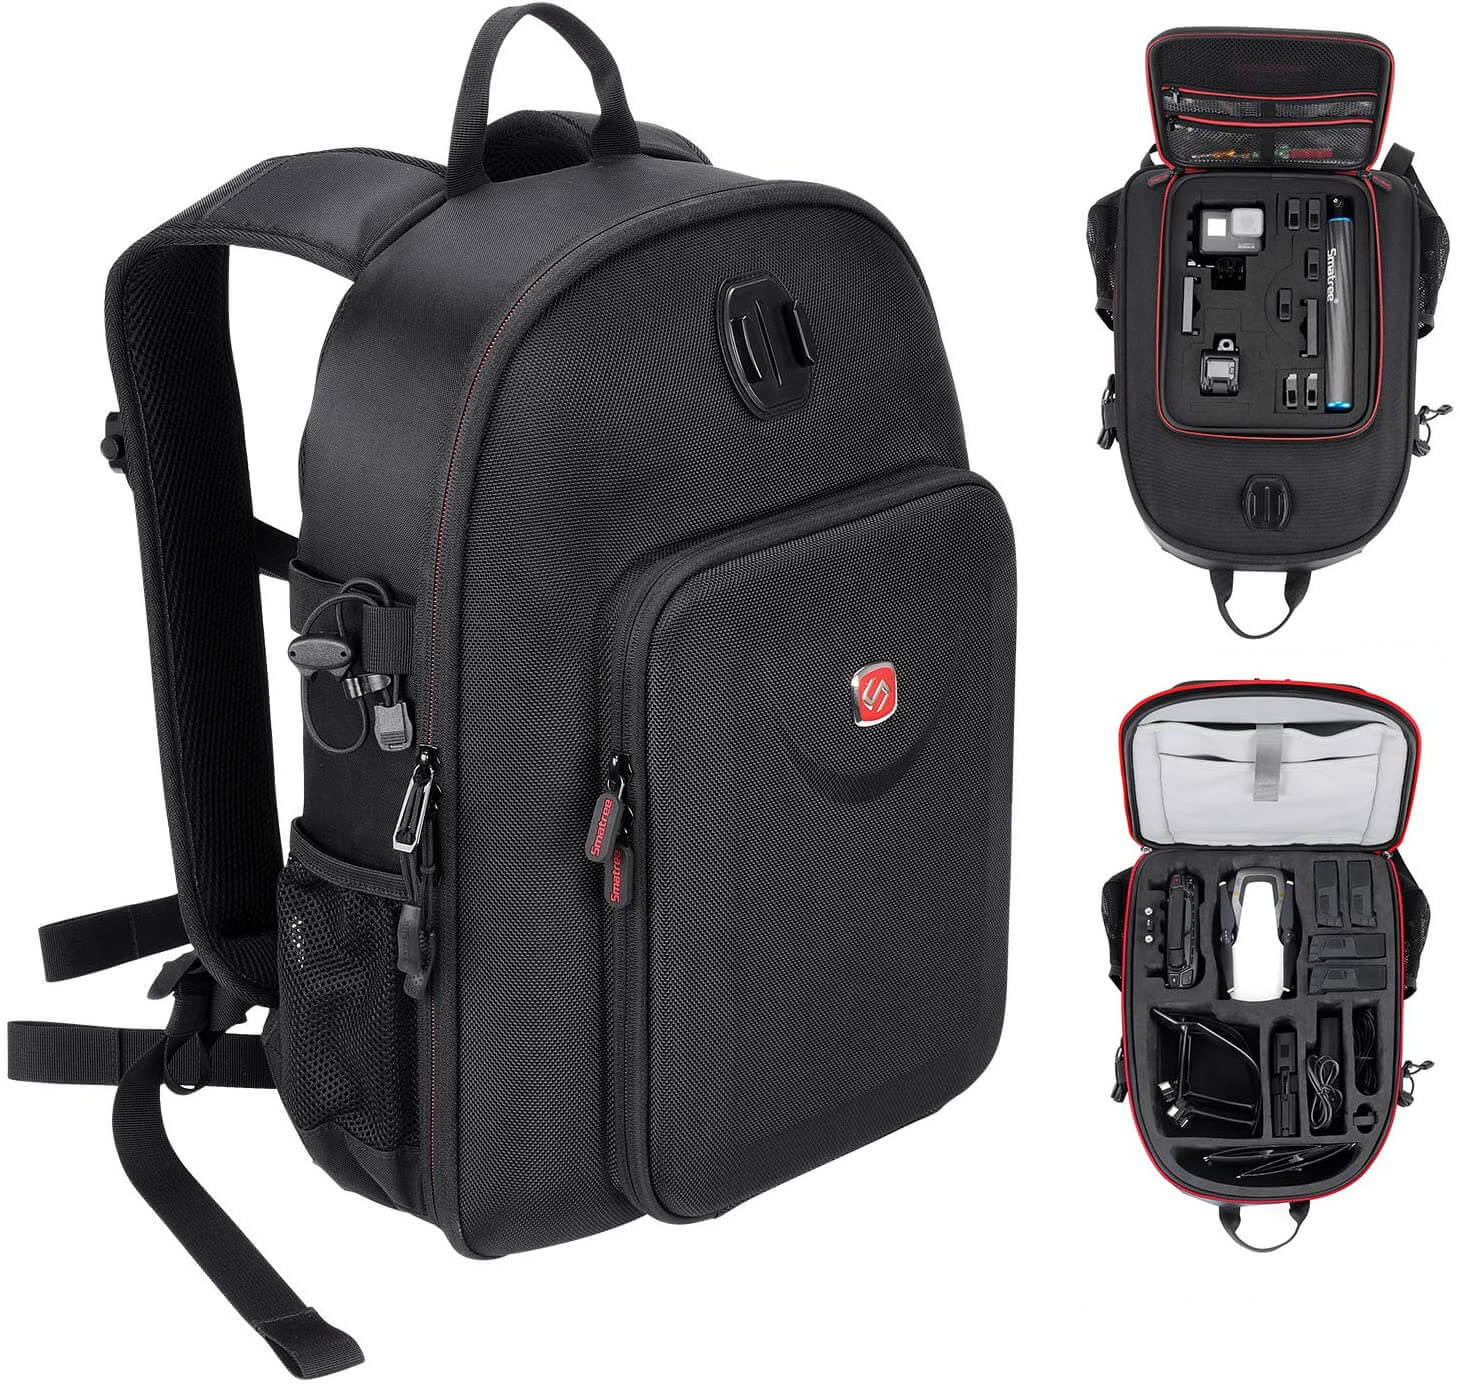 Smatree Travel Backpack